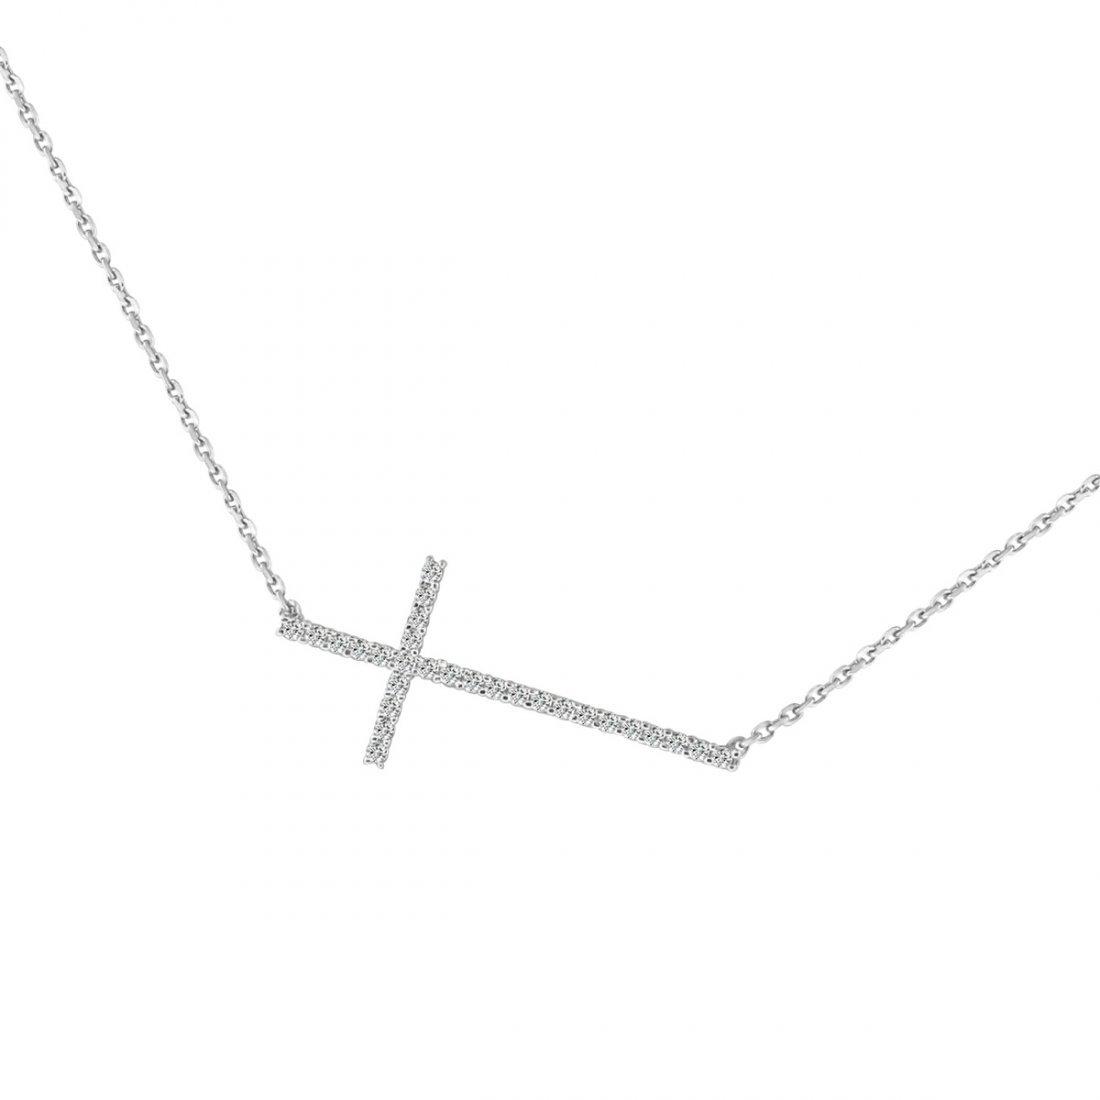 Sterling Silver Rhodium Plated and CZ dainty sideway cr